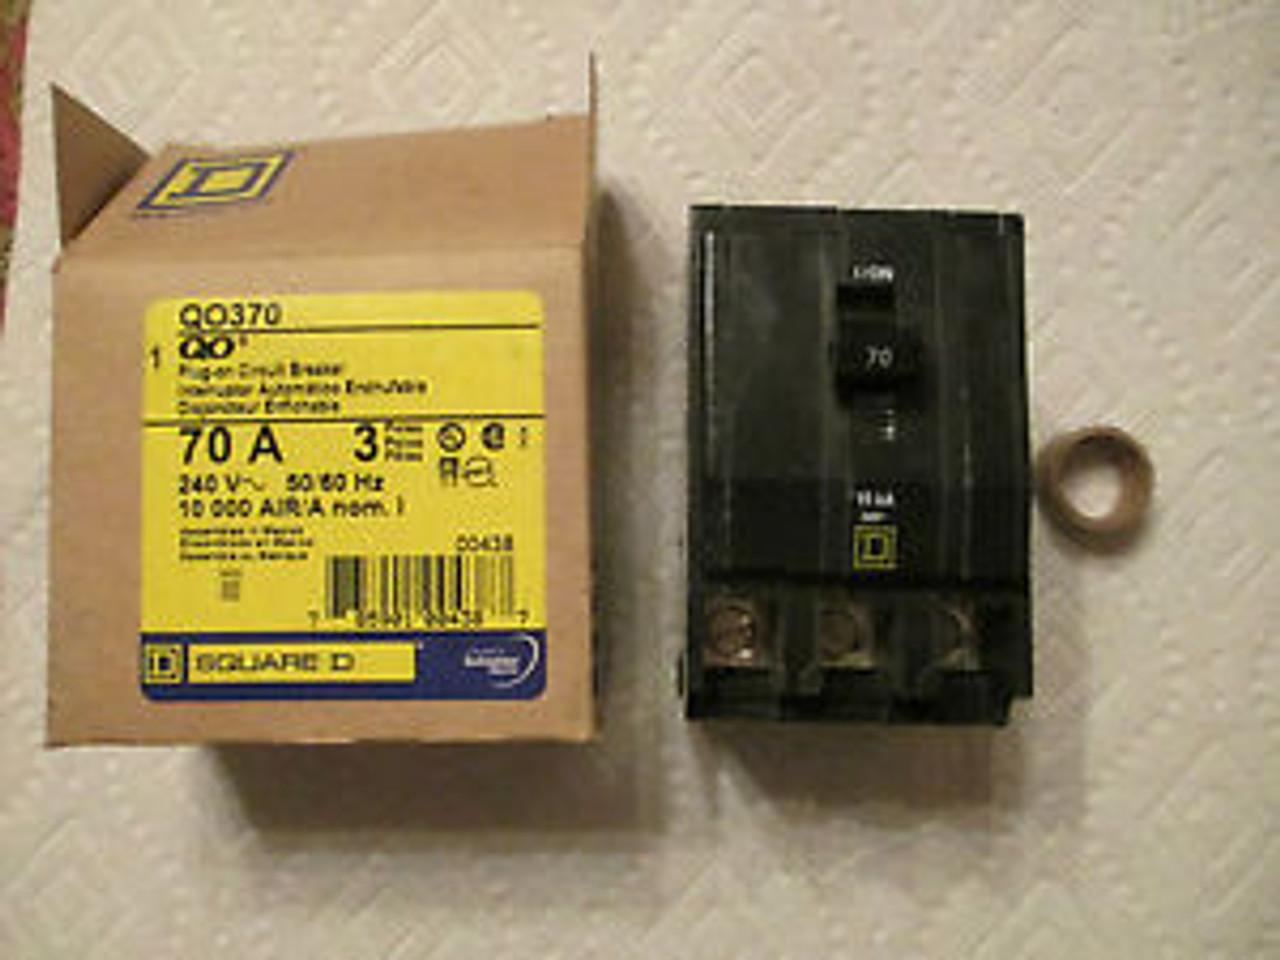 Square D QO370 3 Pole 70 Amp Plug-On Circuit Breaker Older Style